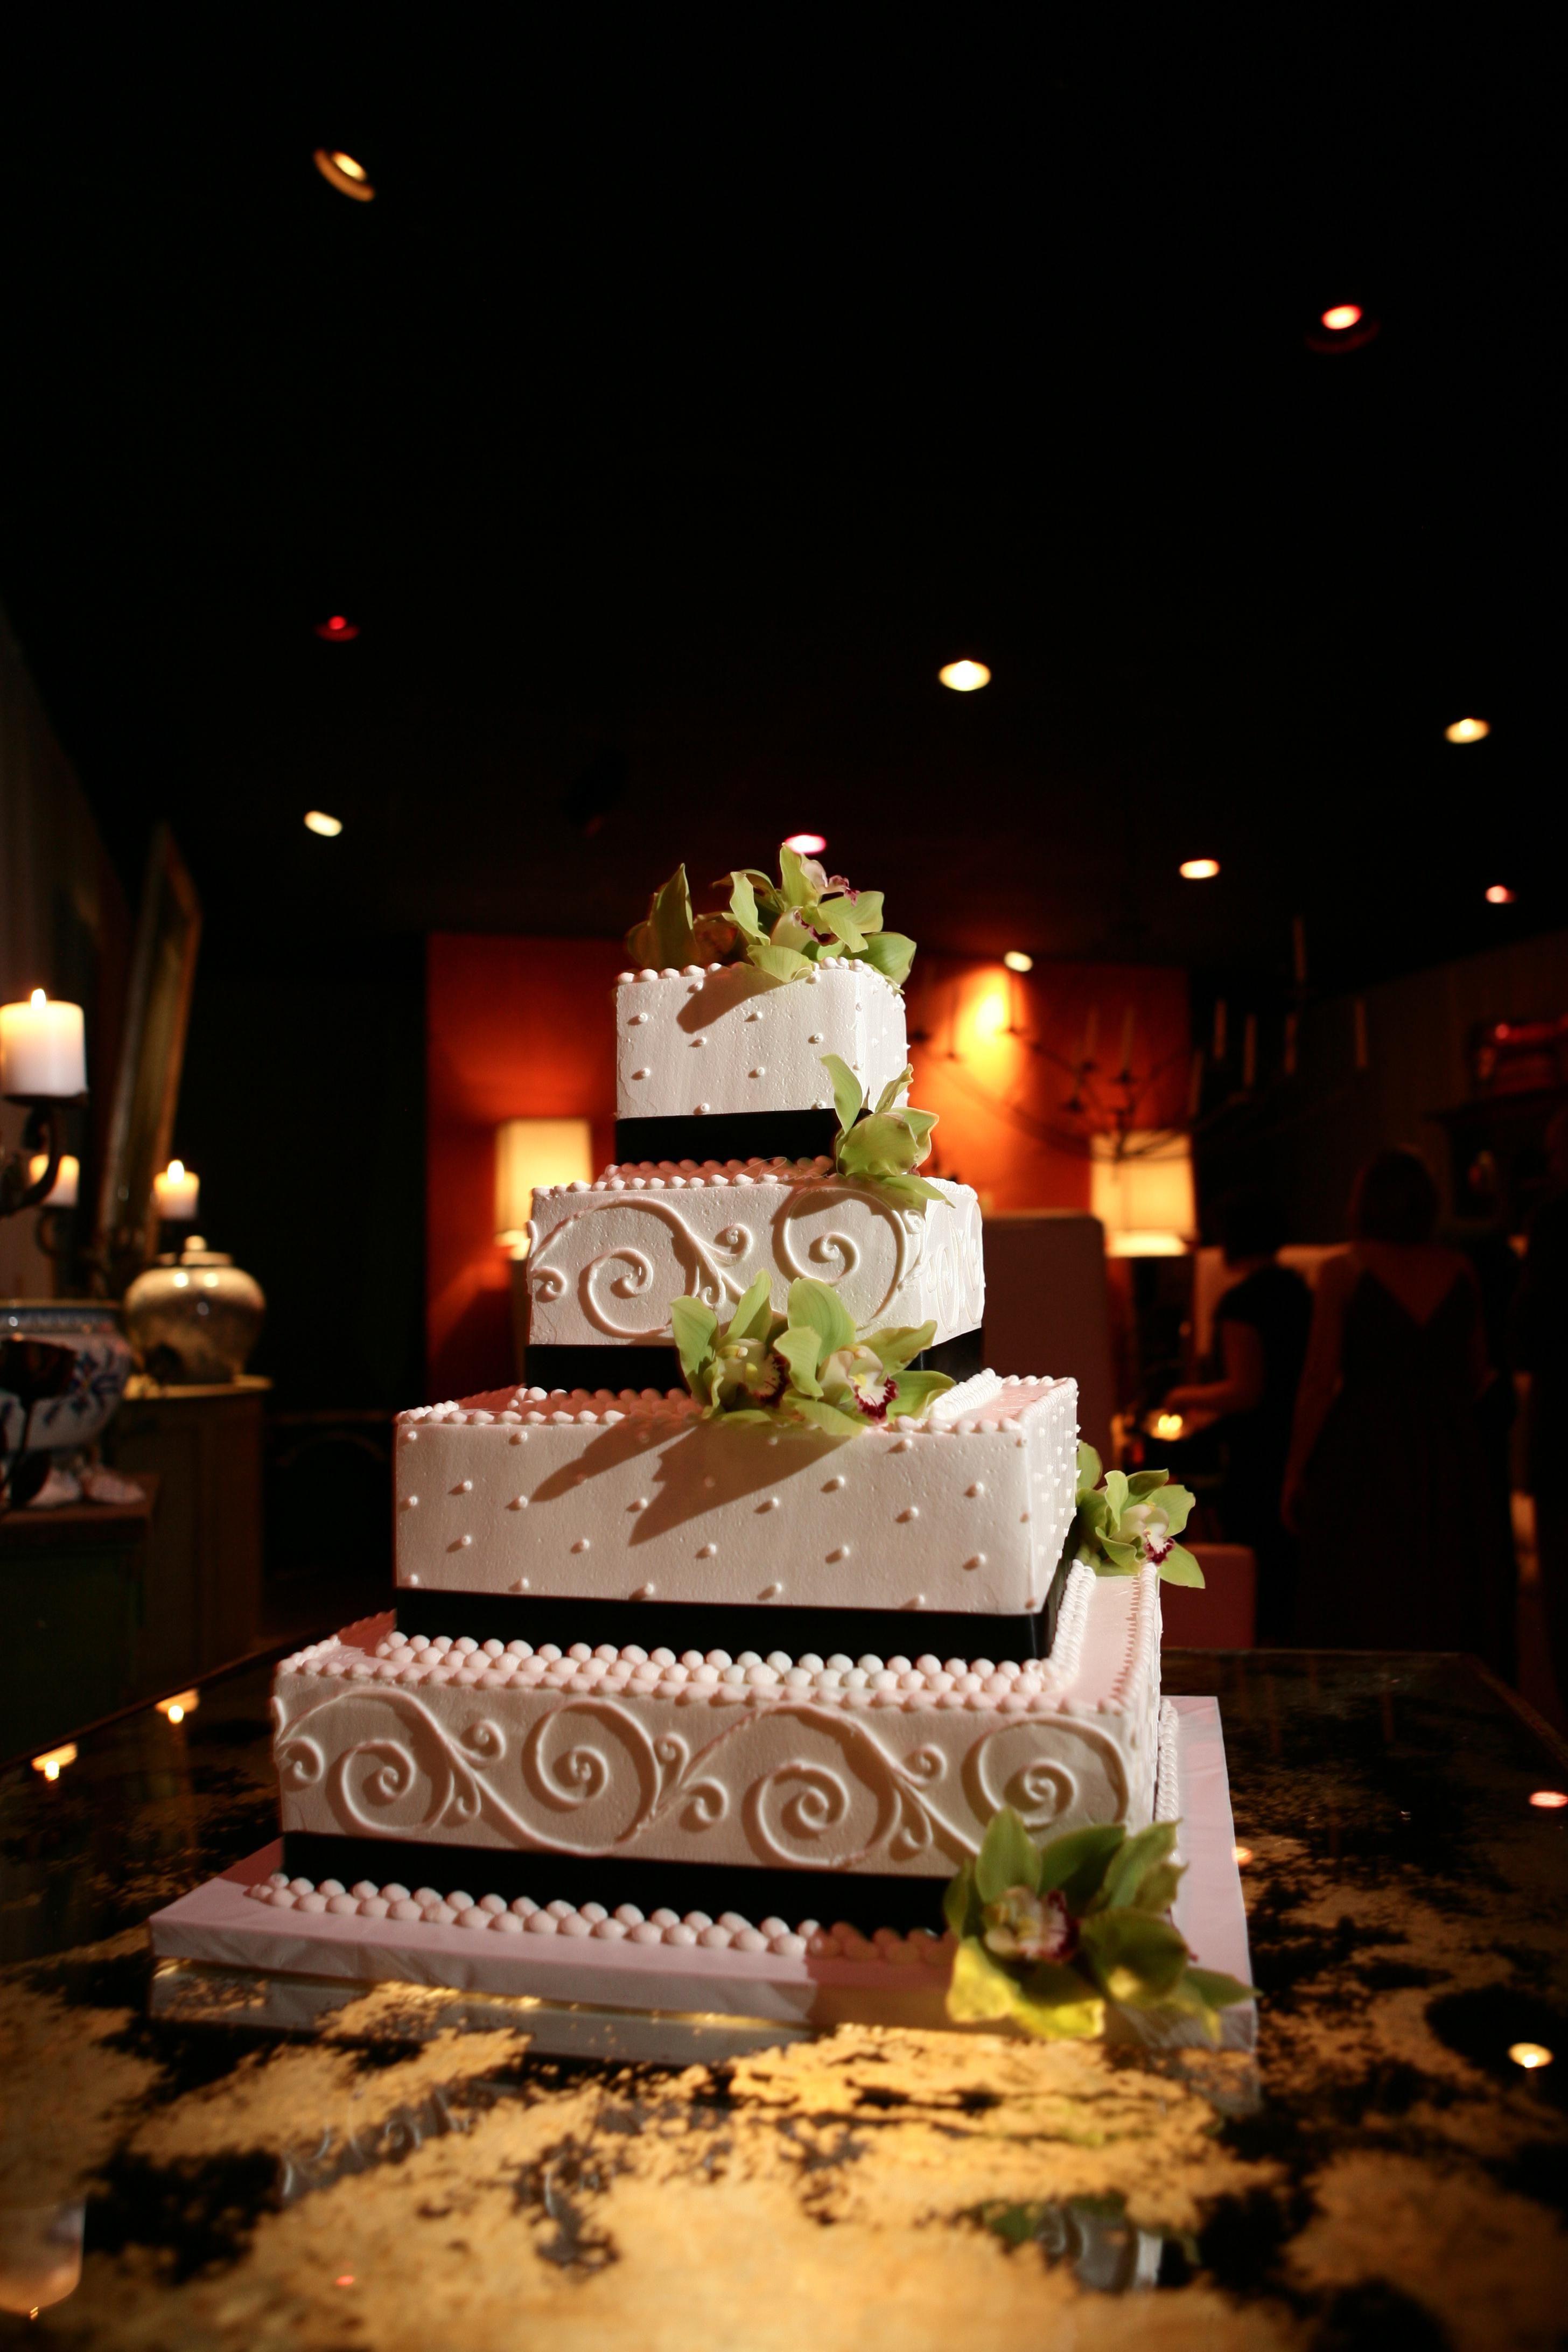 Nigerian wedding decoration images  Like the fun dot design on third tier  Wedding Cakes u Desserts